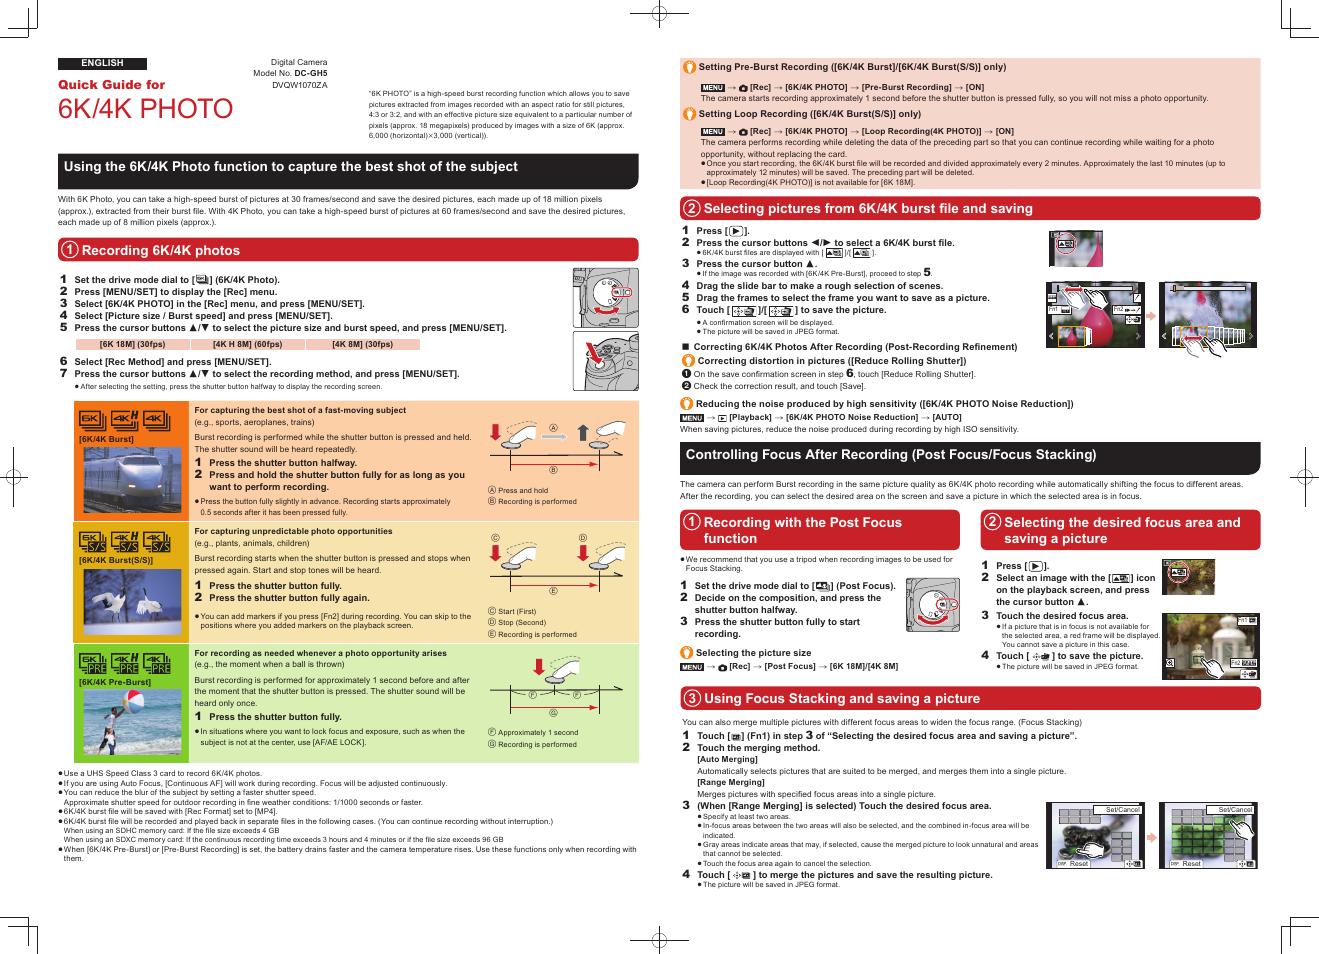 panasonic lumix tz90 user manual